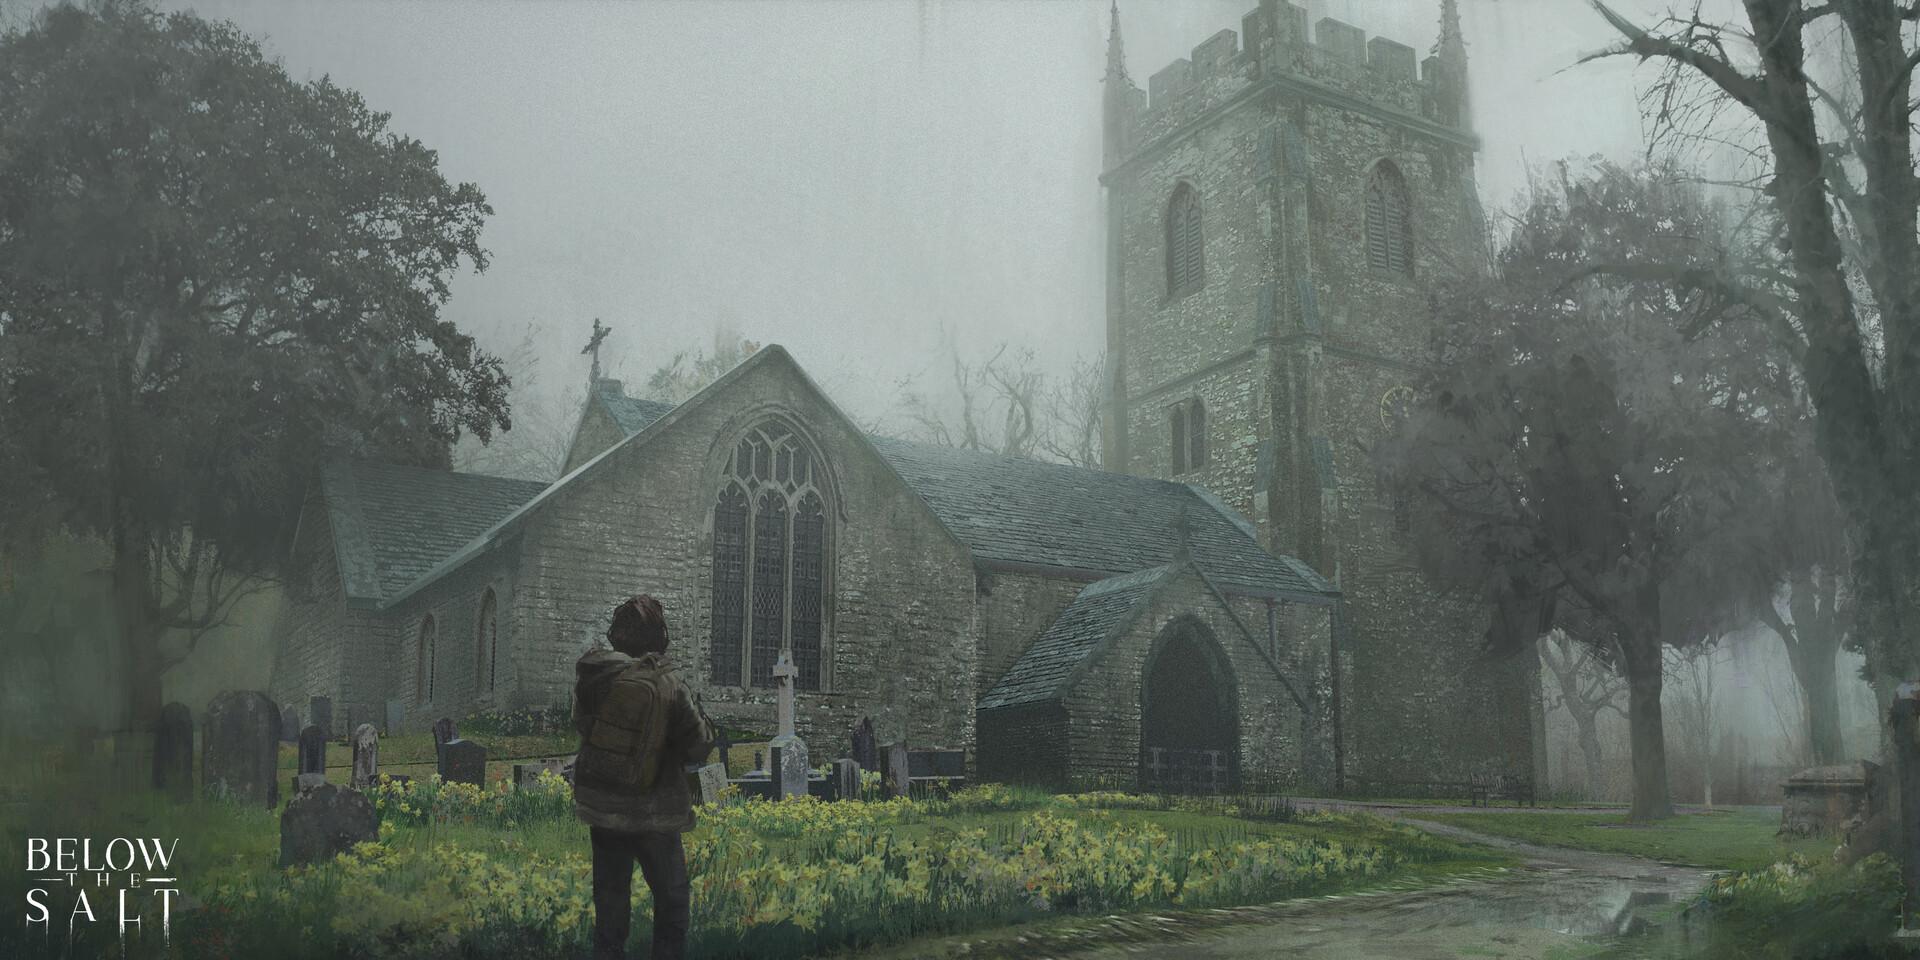 Connor sheehan blackwoods church beauty2019